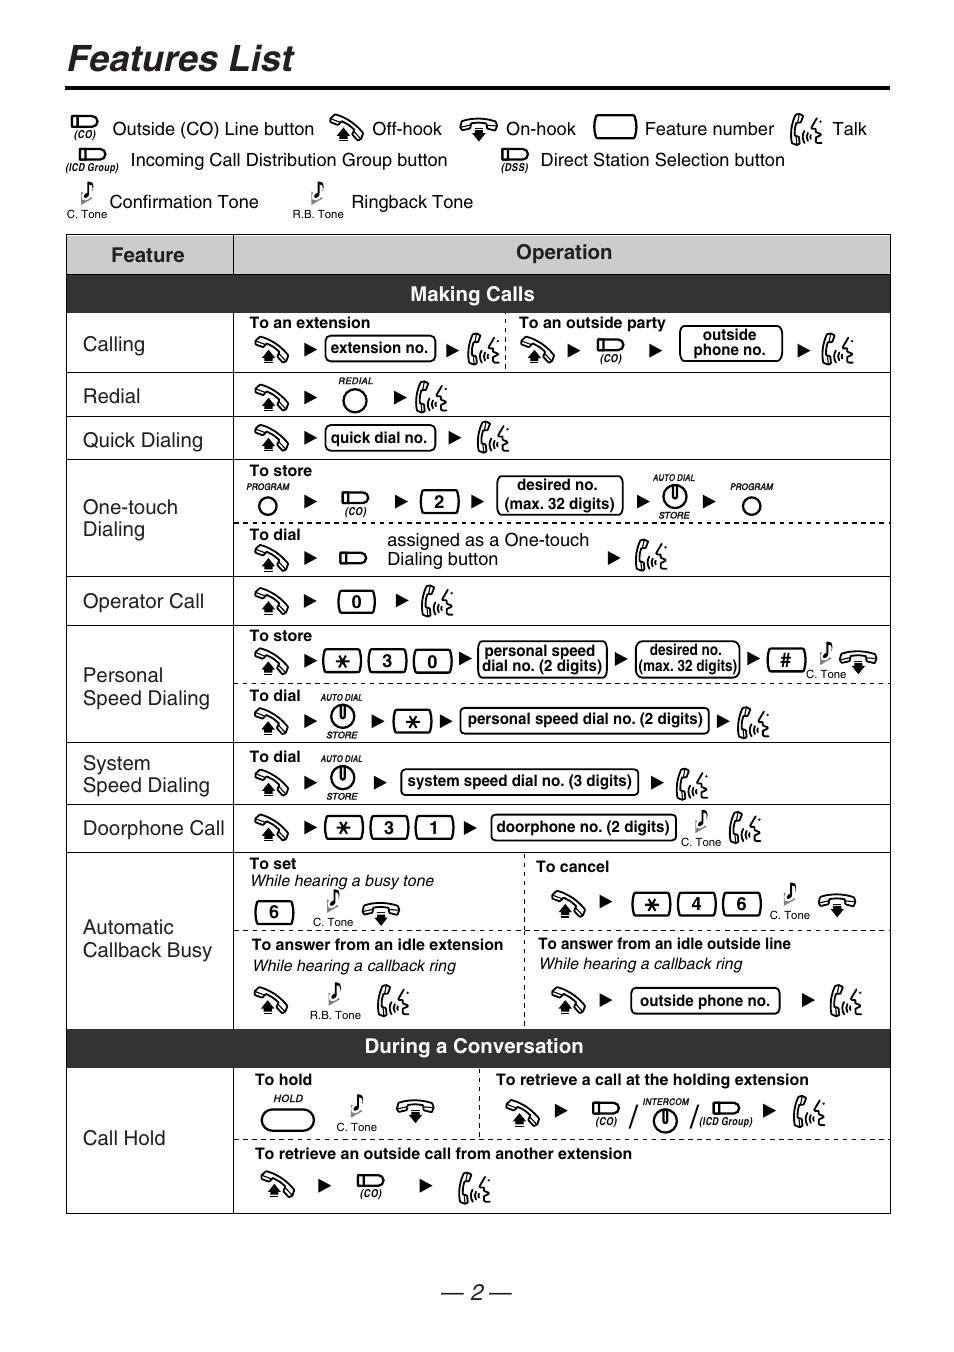 features list panasonic kx t7667 user manual page 2 10 rh manualsdir com panasonic digital super hybrid system kx-t7667 manual panasonic kx-t7667 programming manual